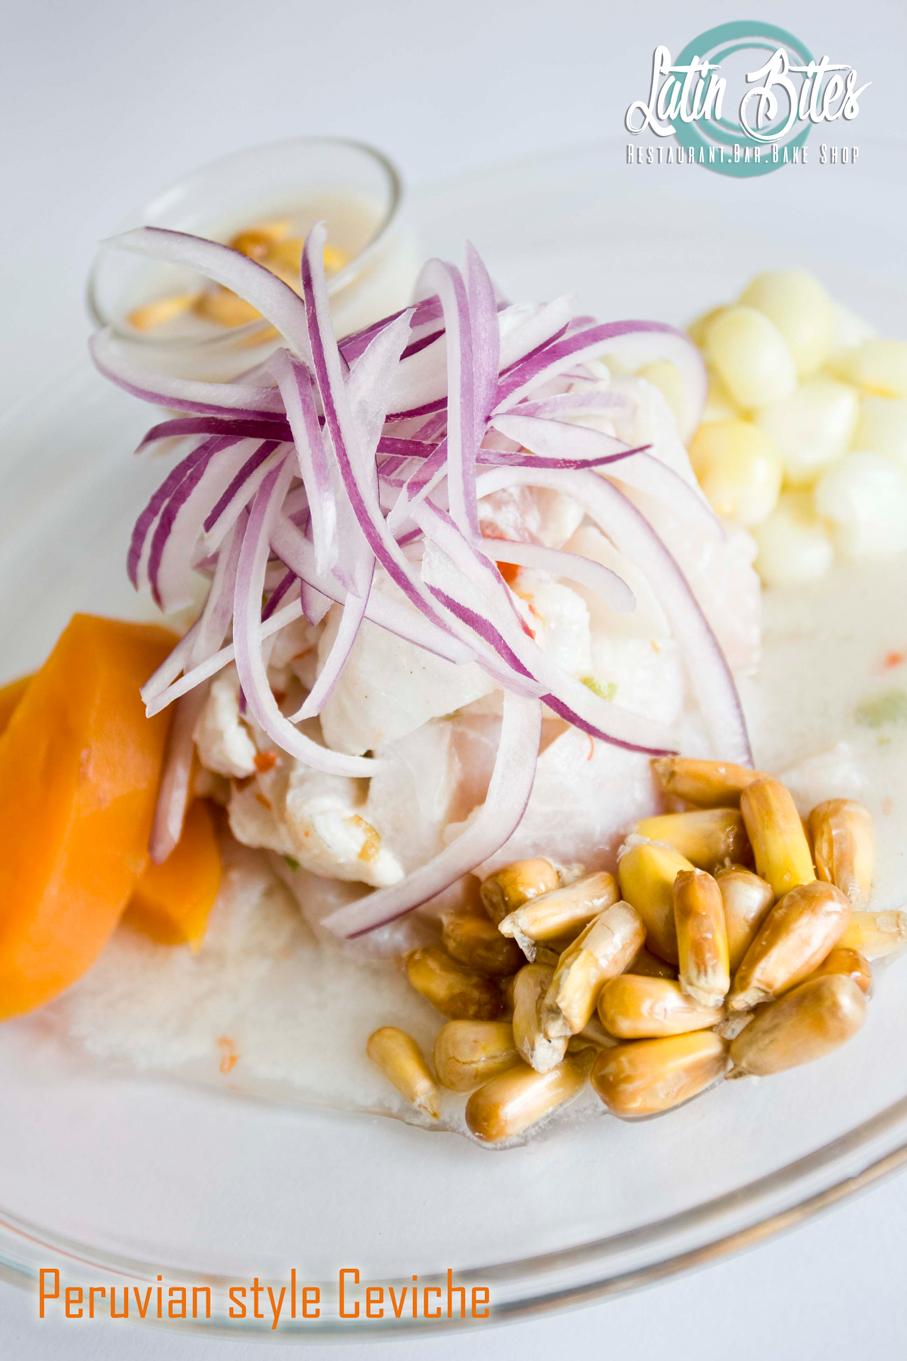 Best Peruvian Ceviche in Houston